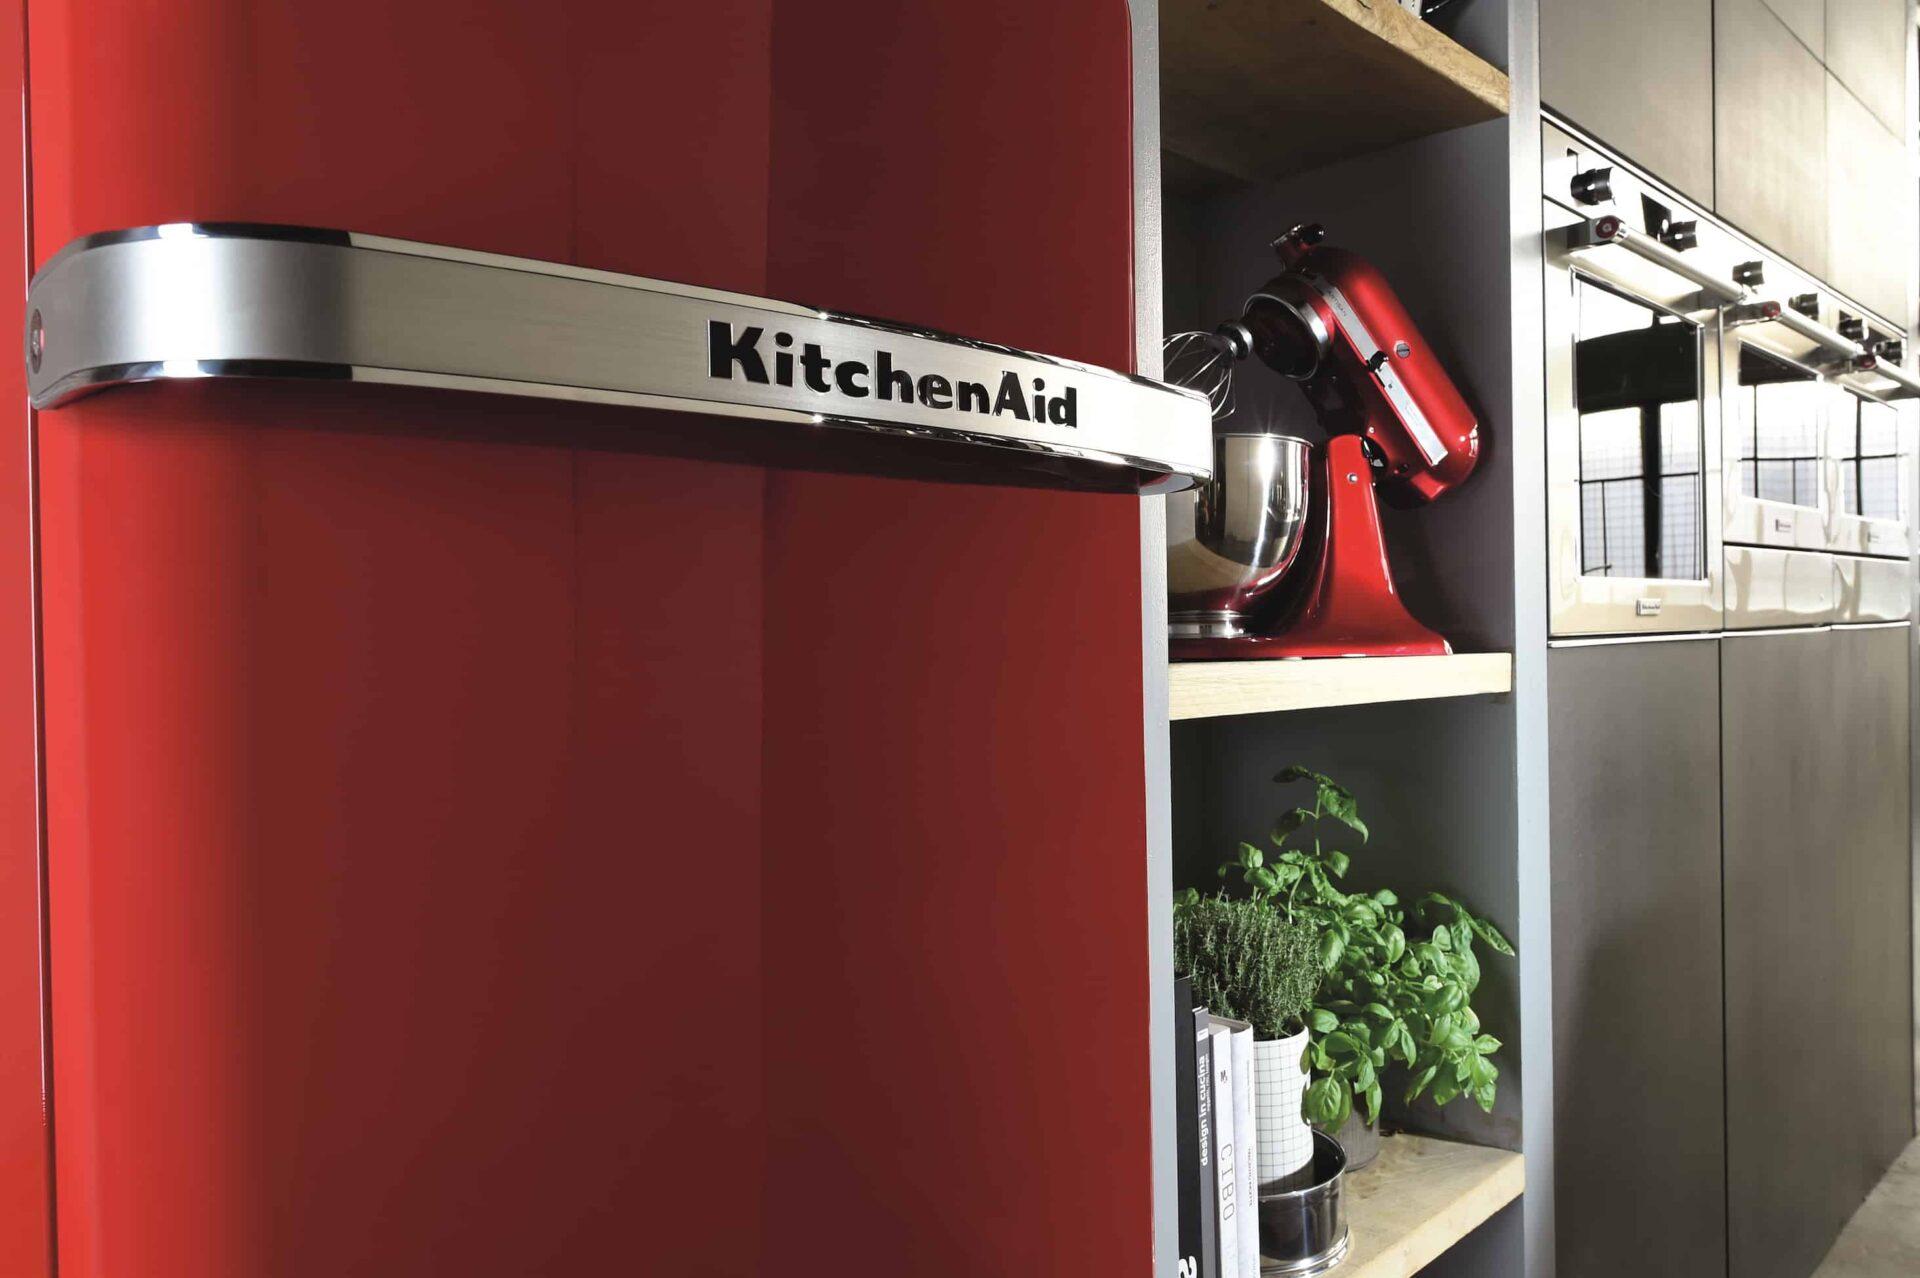 Iconic Fridge KitchenAid, l'iconico frigo dal sapore retro